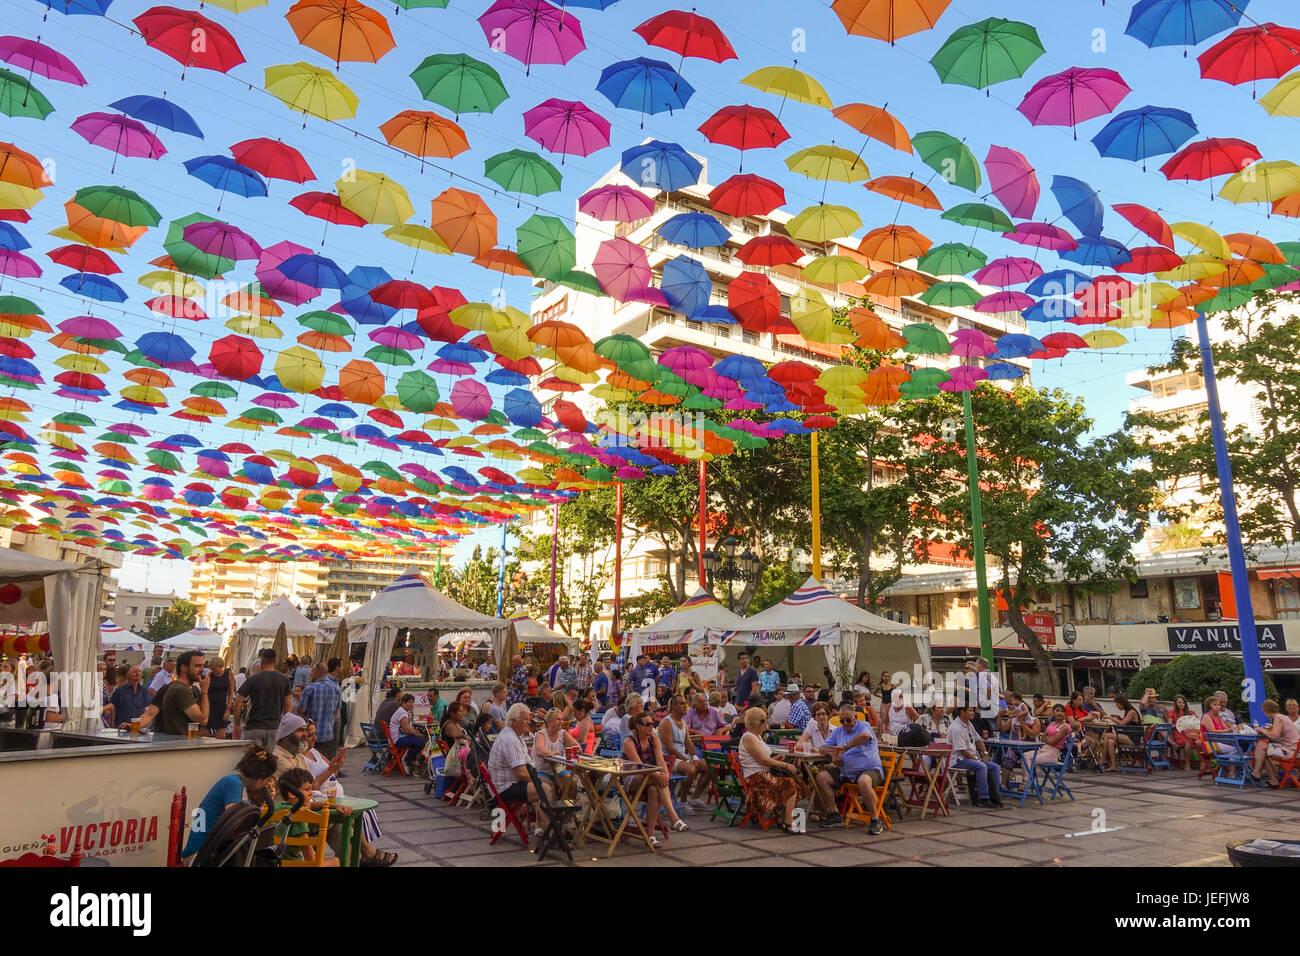 Festival de comida de diferentes culturas, Torremolinos, Málaga, Andalucía. Imagen De Stock